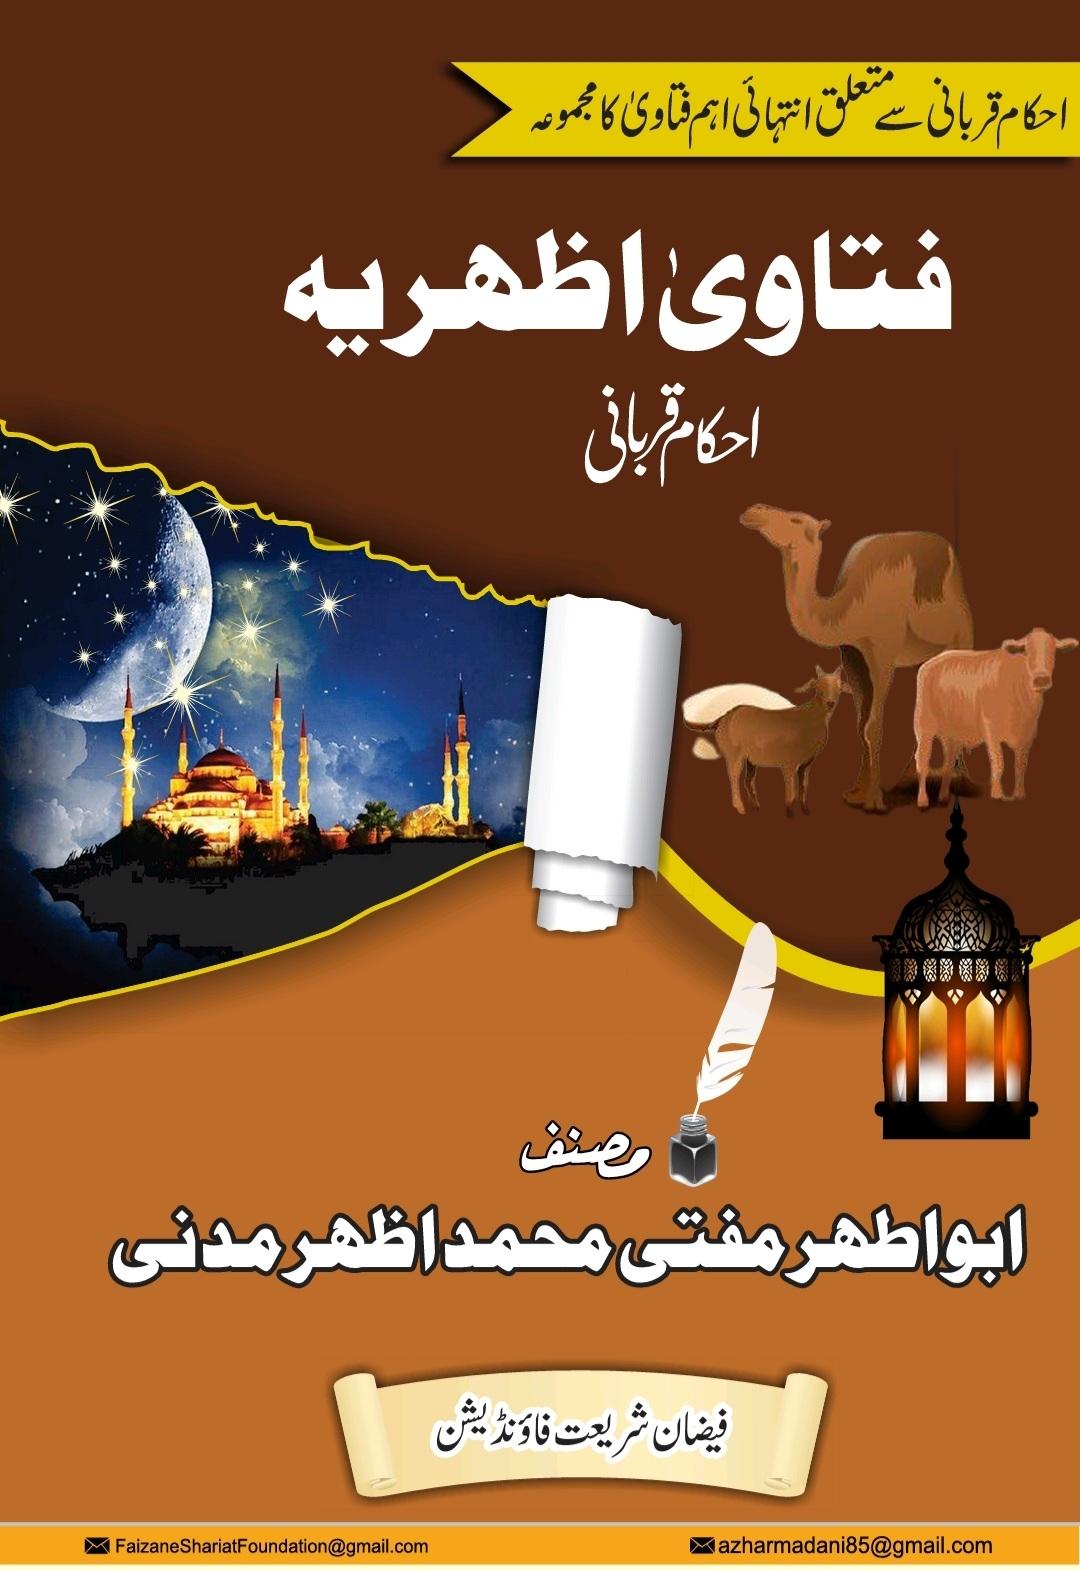 Fatawa Azharia Ahkam E Qurbani / فتاوی اظہریہ احکام قربانی by مفتی ابو اطہر محمد اظہر مدنی